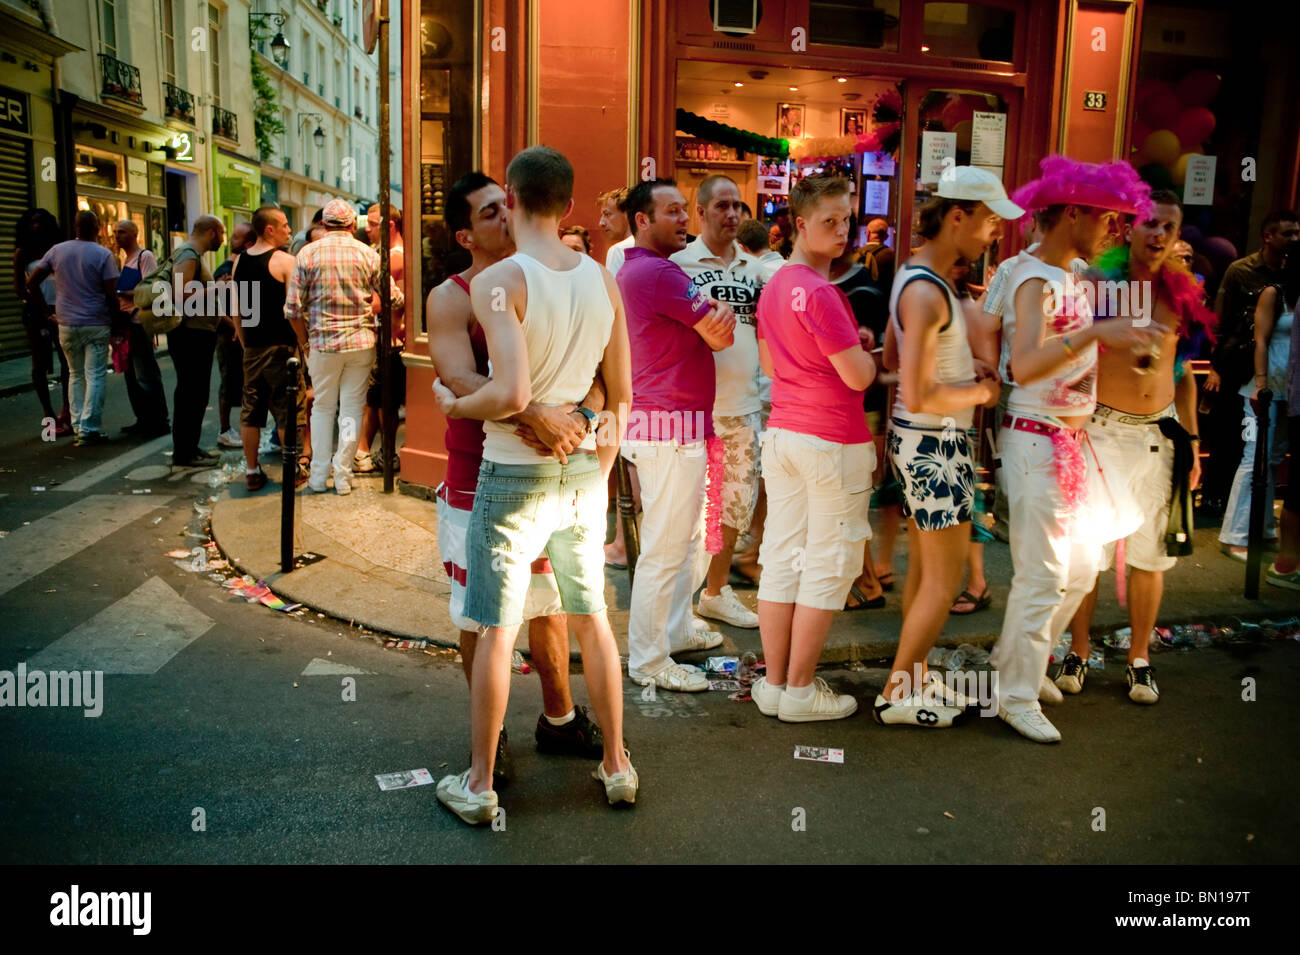 from Zayden gay bars in paris france